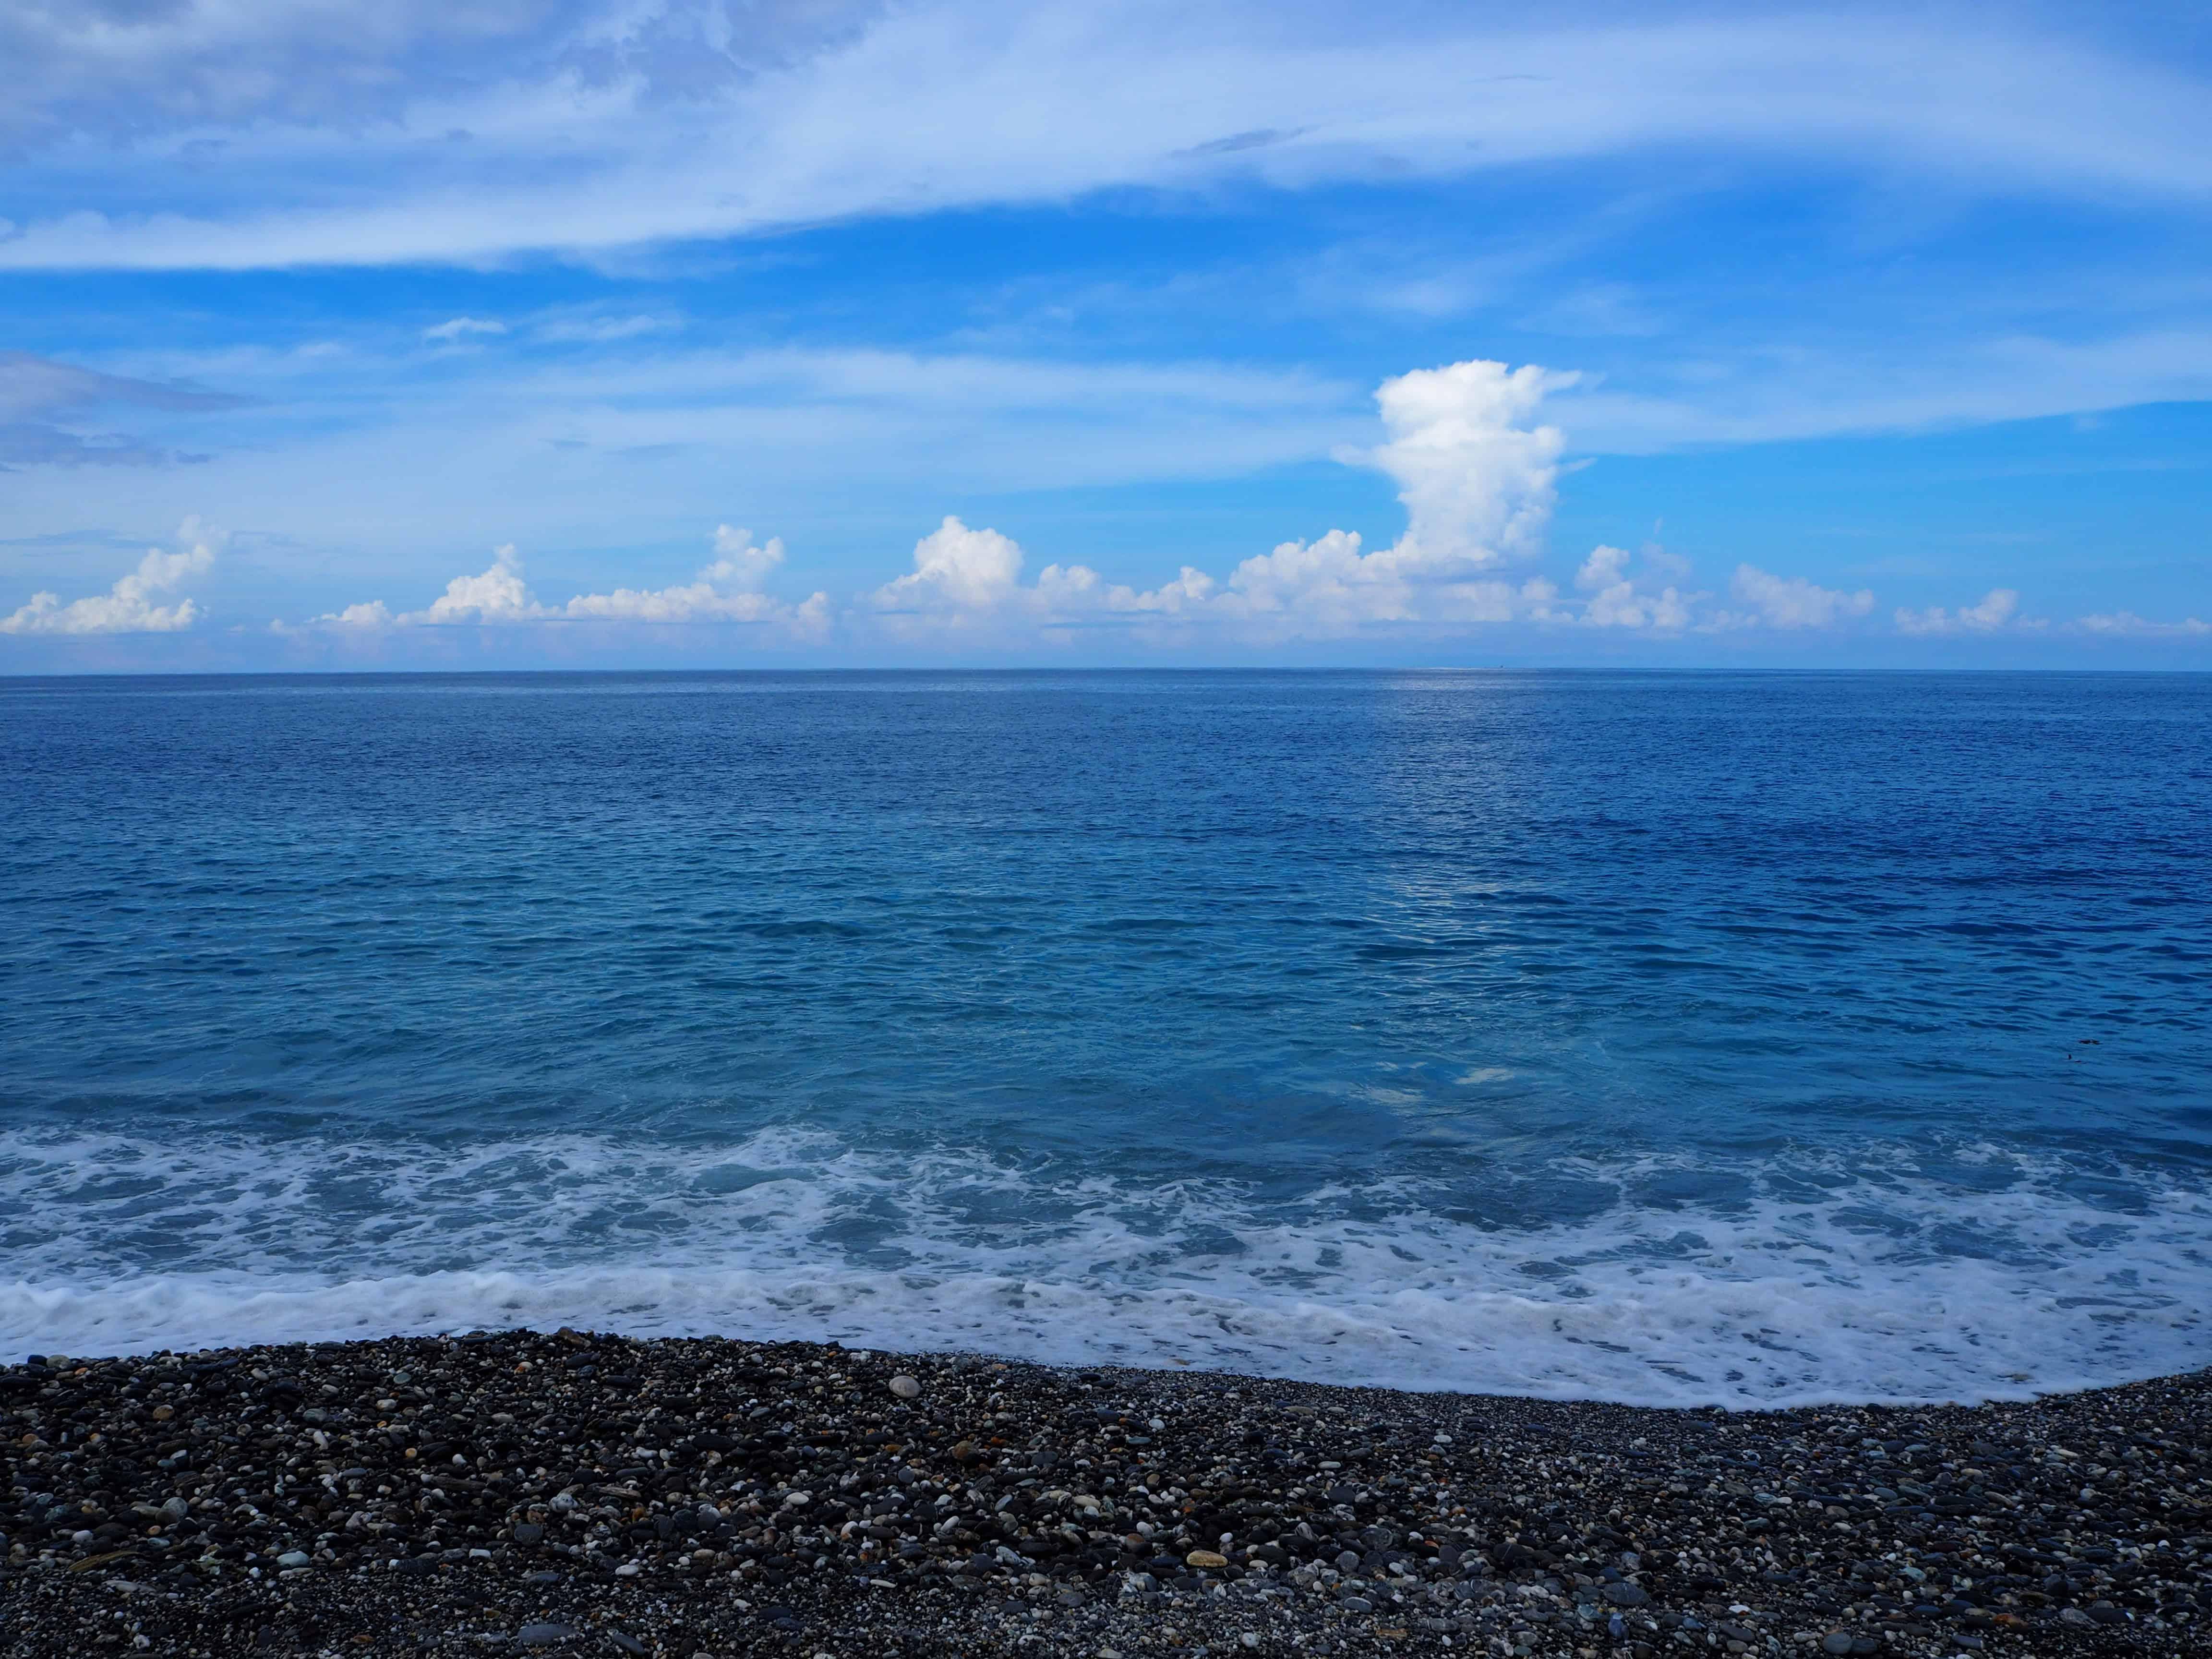 mer et galets noirs